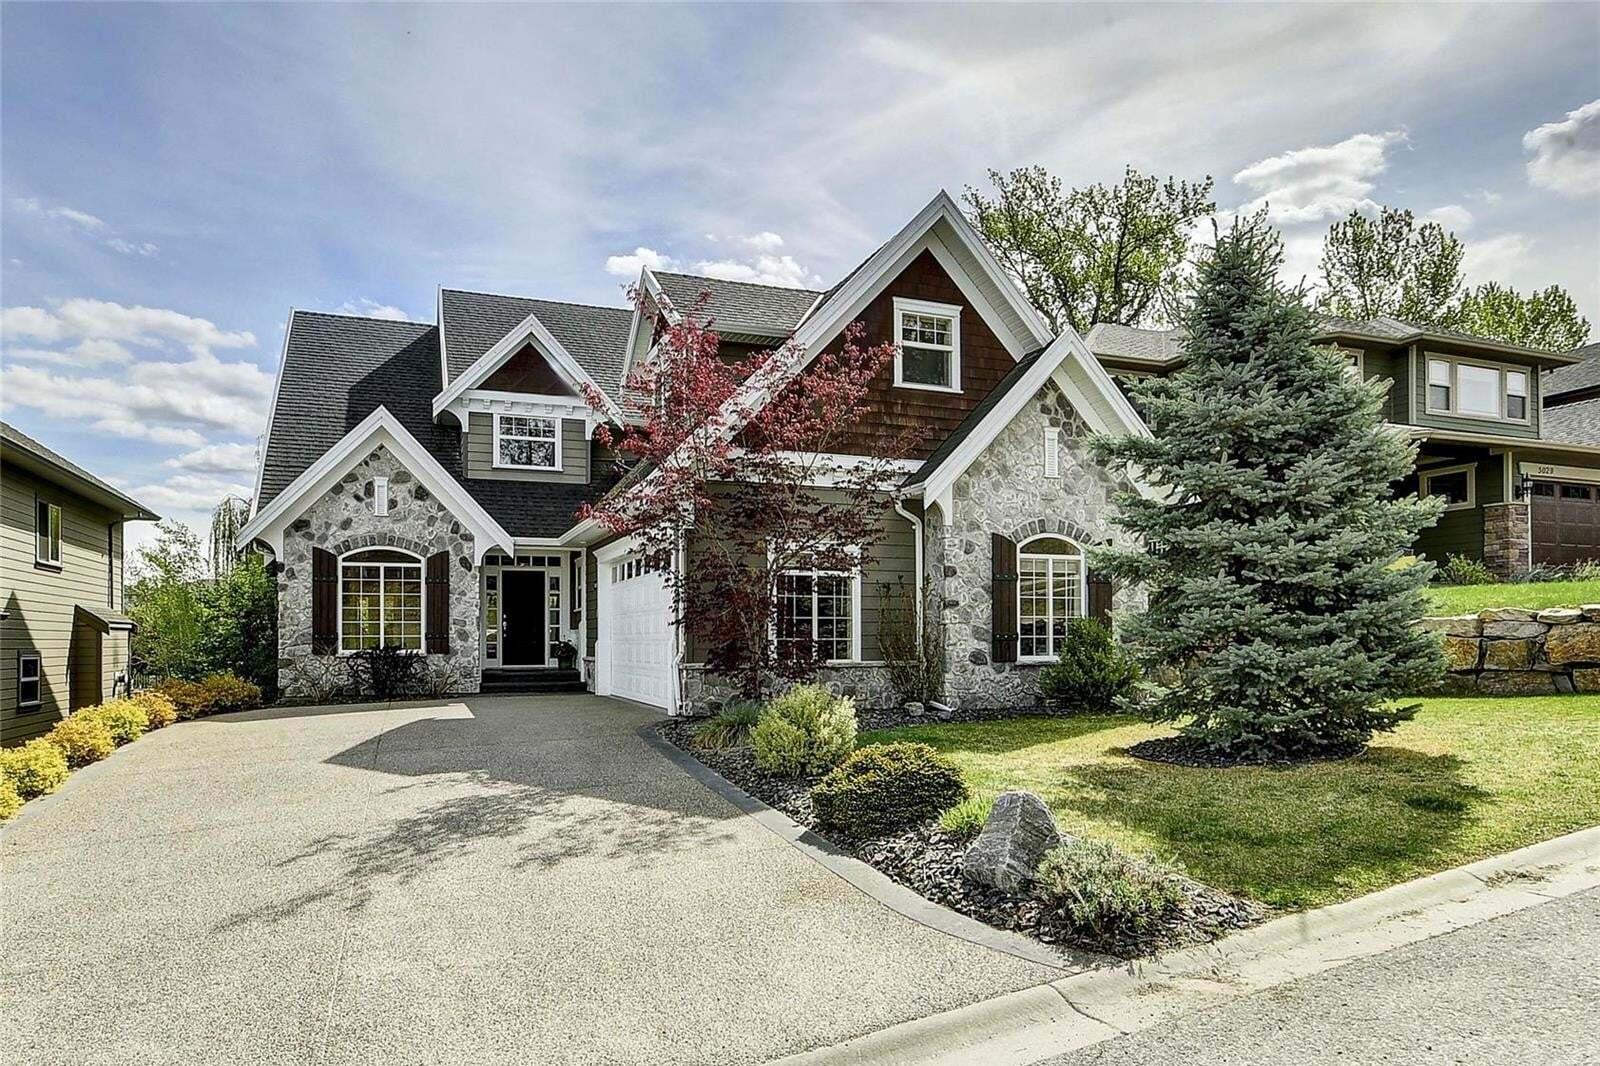 House for sale at 5025 Treadgold Ct Kelowna British Columbia - MLS: 10204677